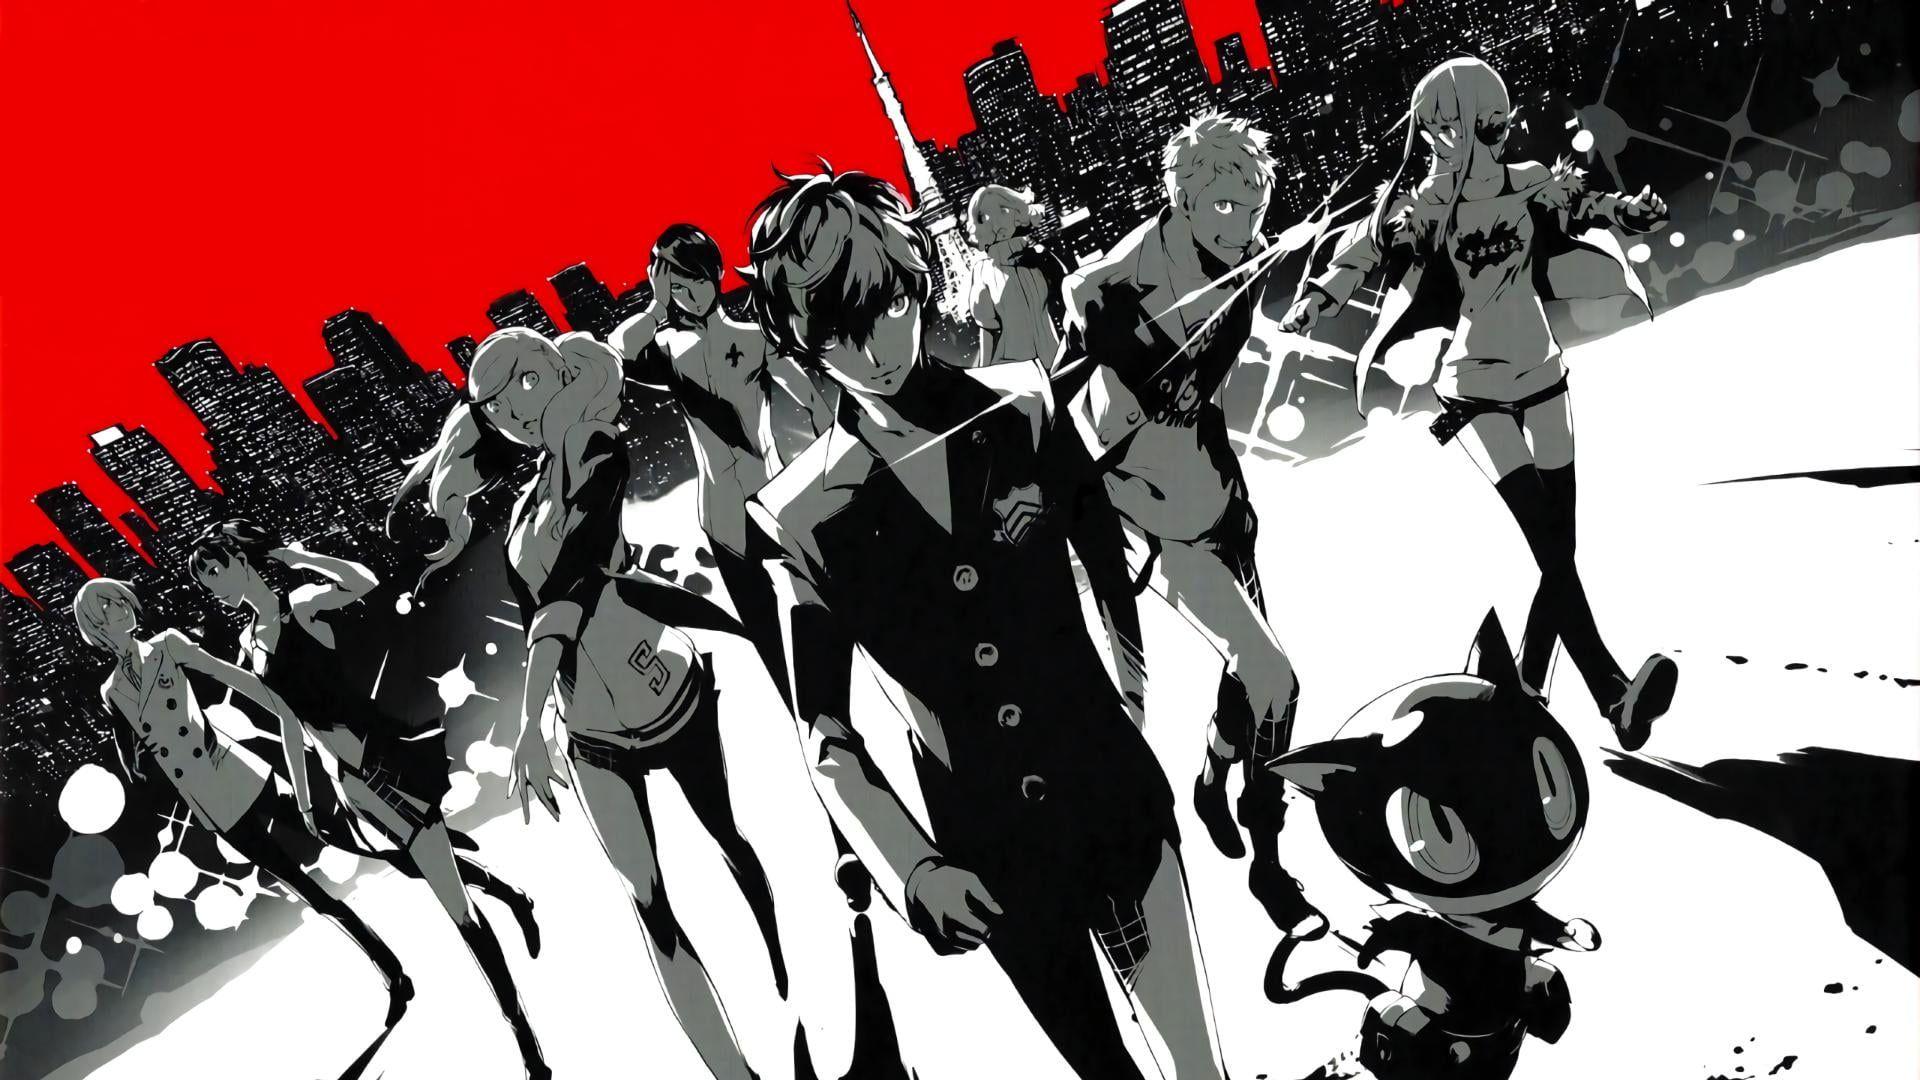 Anime Characters Digital Wallpaper Phantom Thieves Persona Series Persona 5 Protagonist Persona 5 1080p Wallpaper Hdwa Persona 5 Digital Wallpaper Persona